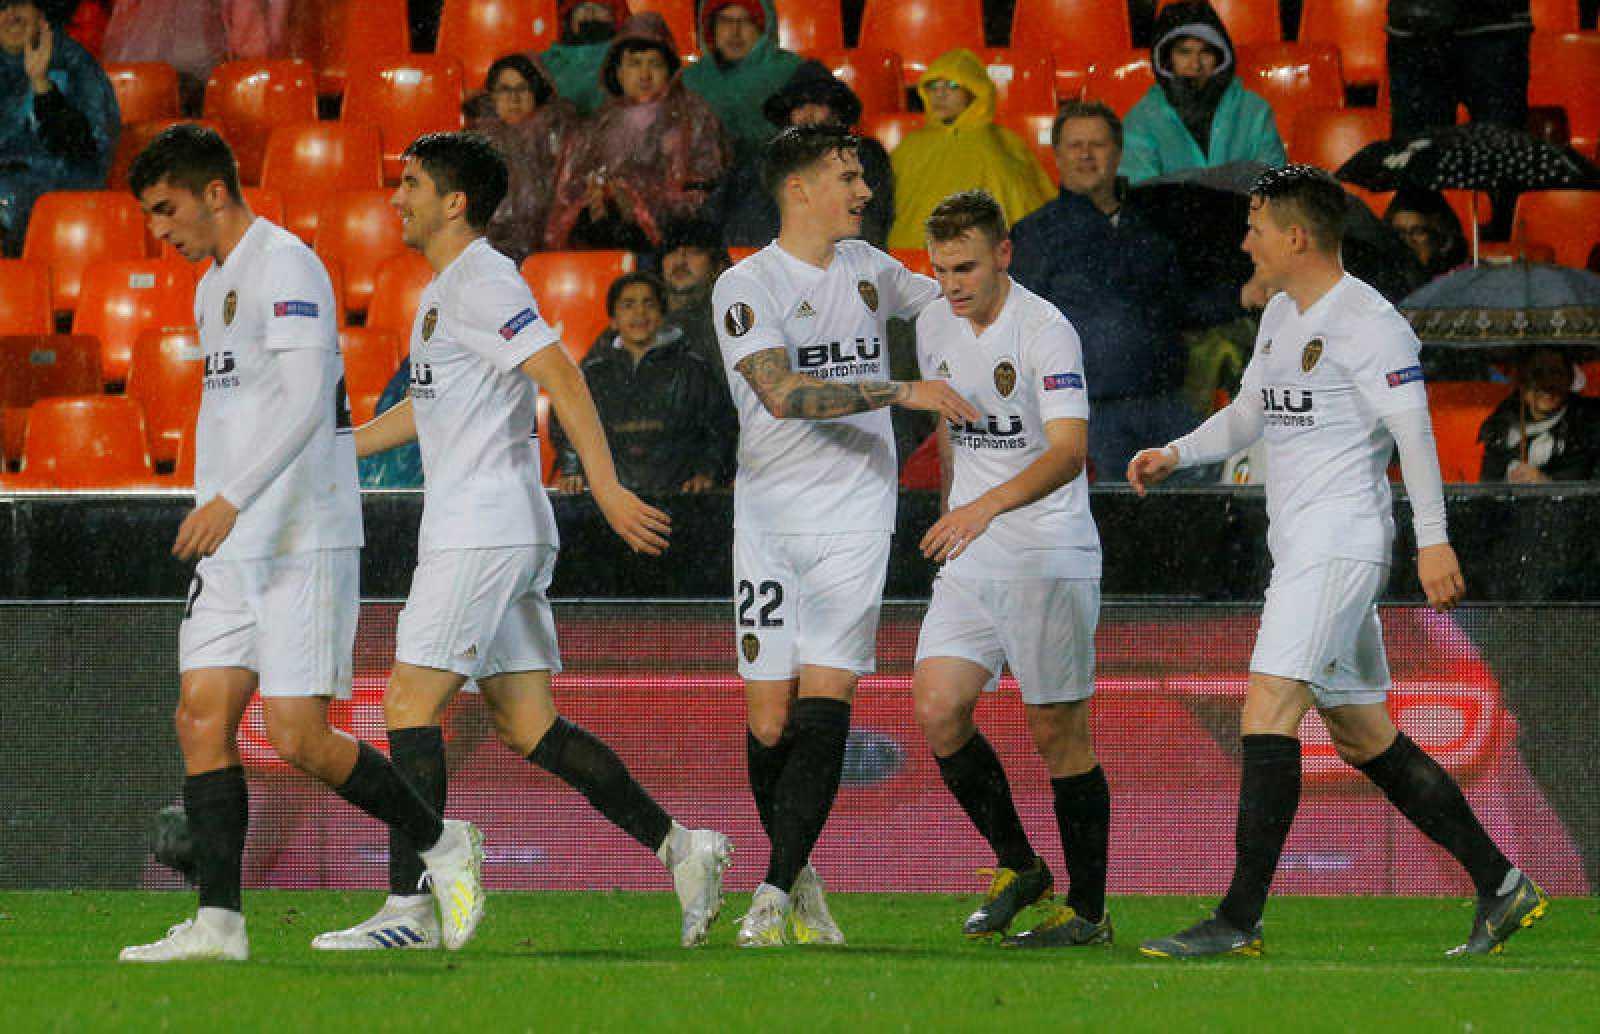 Europa League - Valencia vs Villarreal